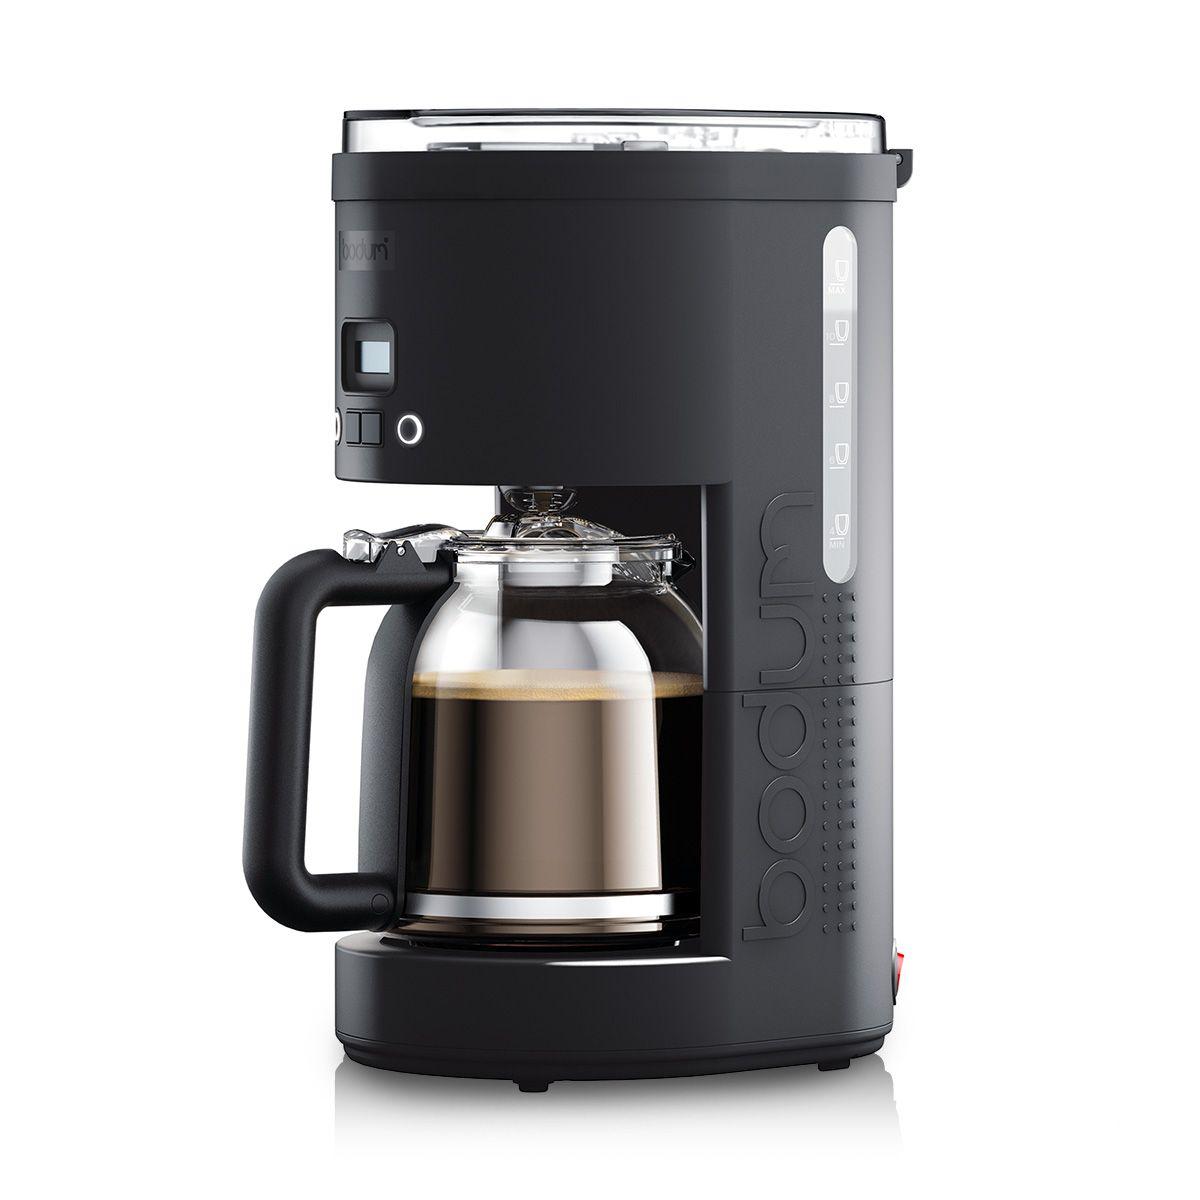 electric coffee maker BODUM